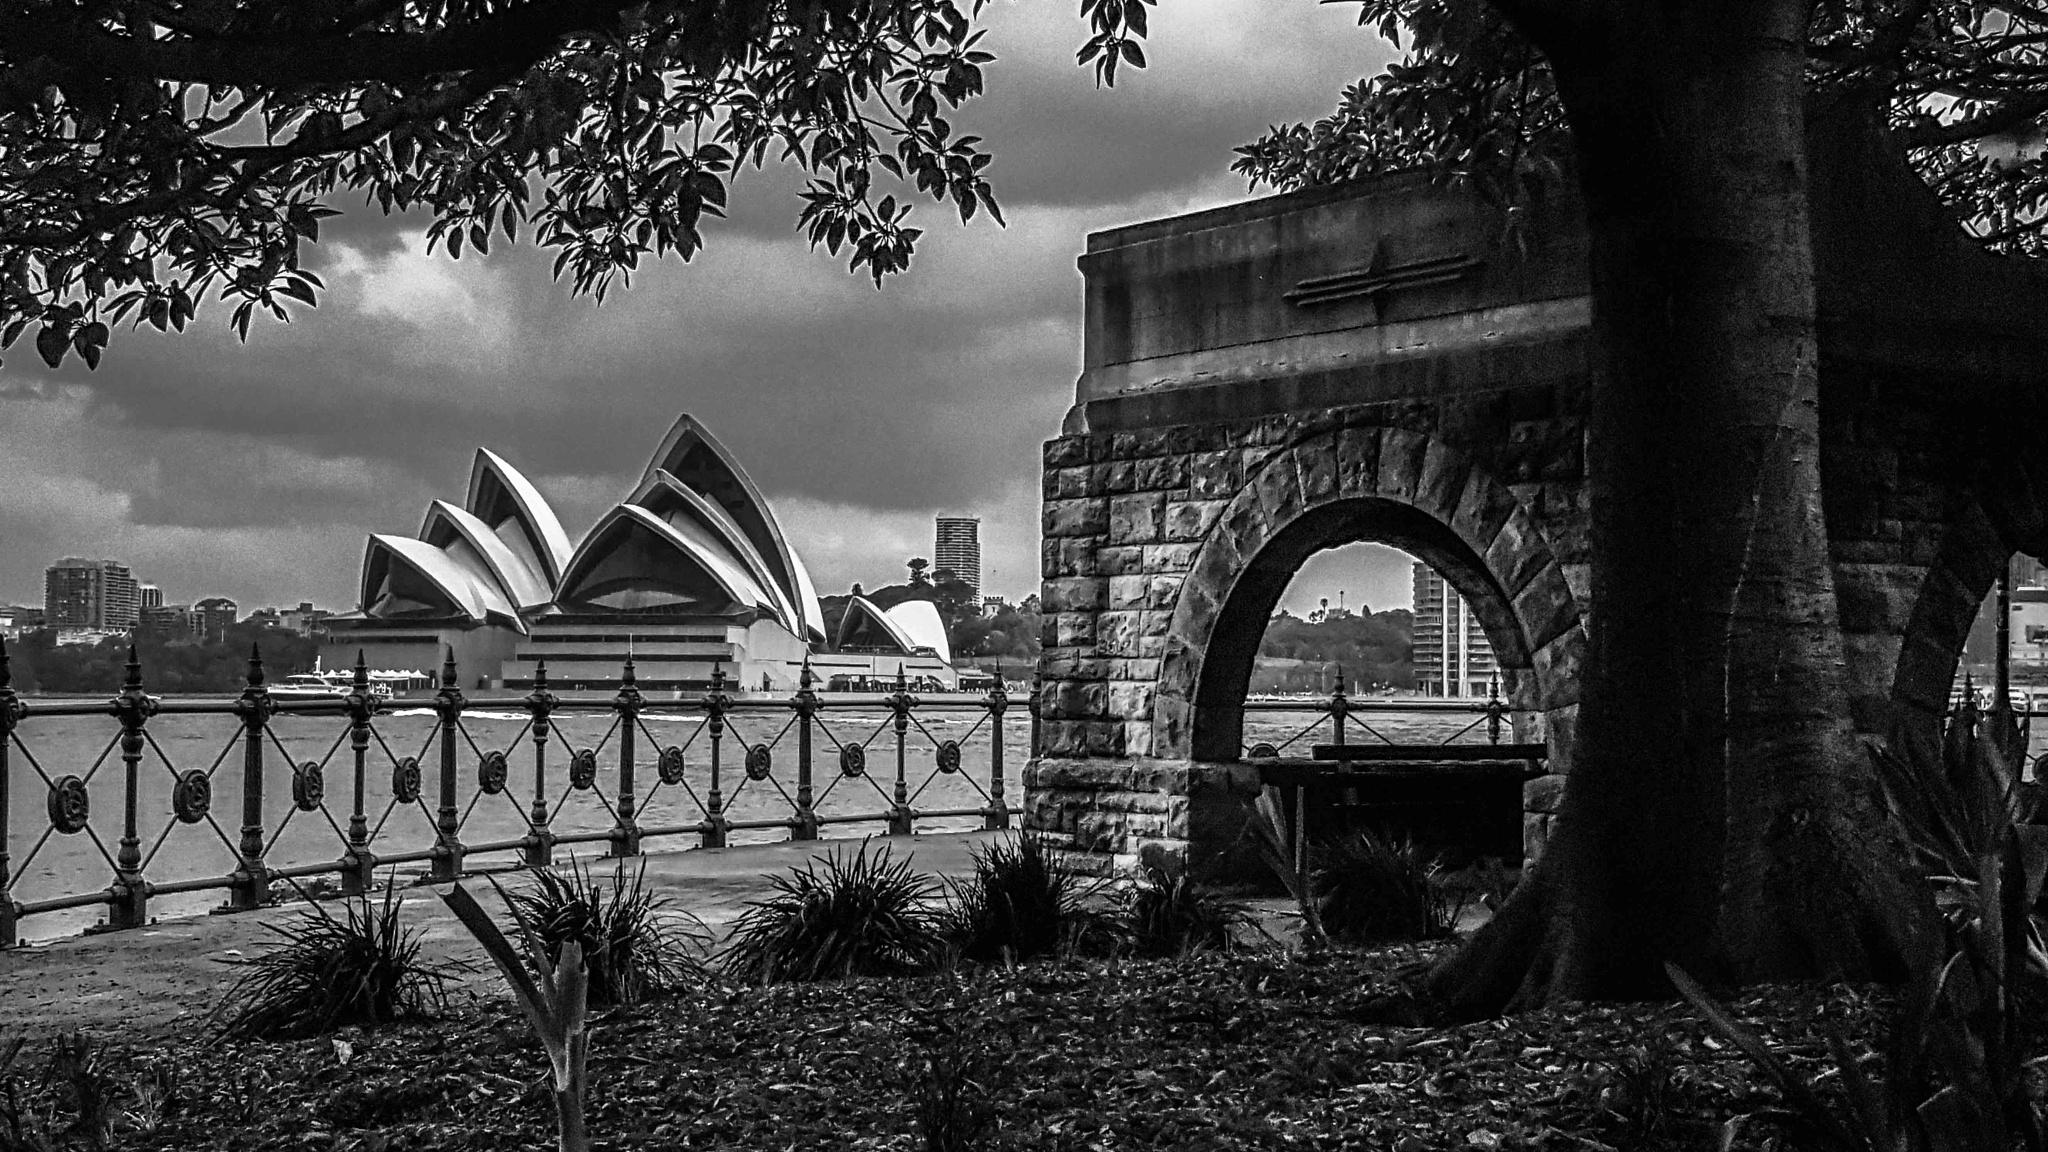 Milsons Point1 (Opera House) by Adam Rybka